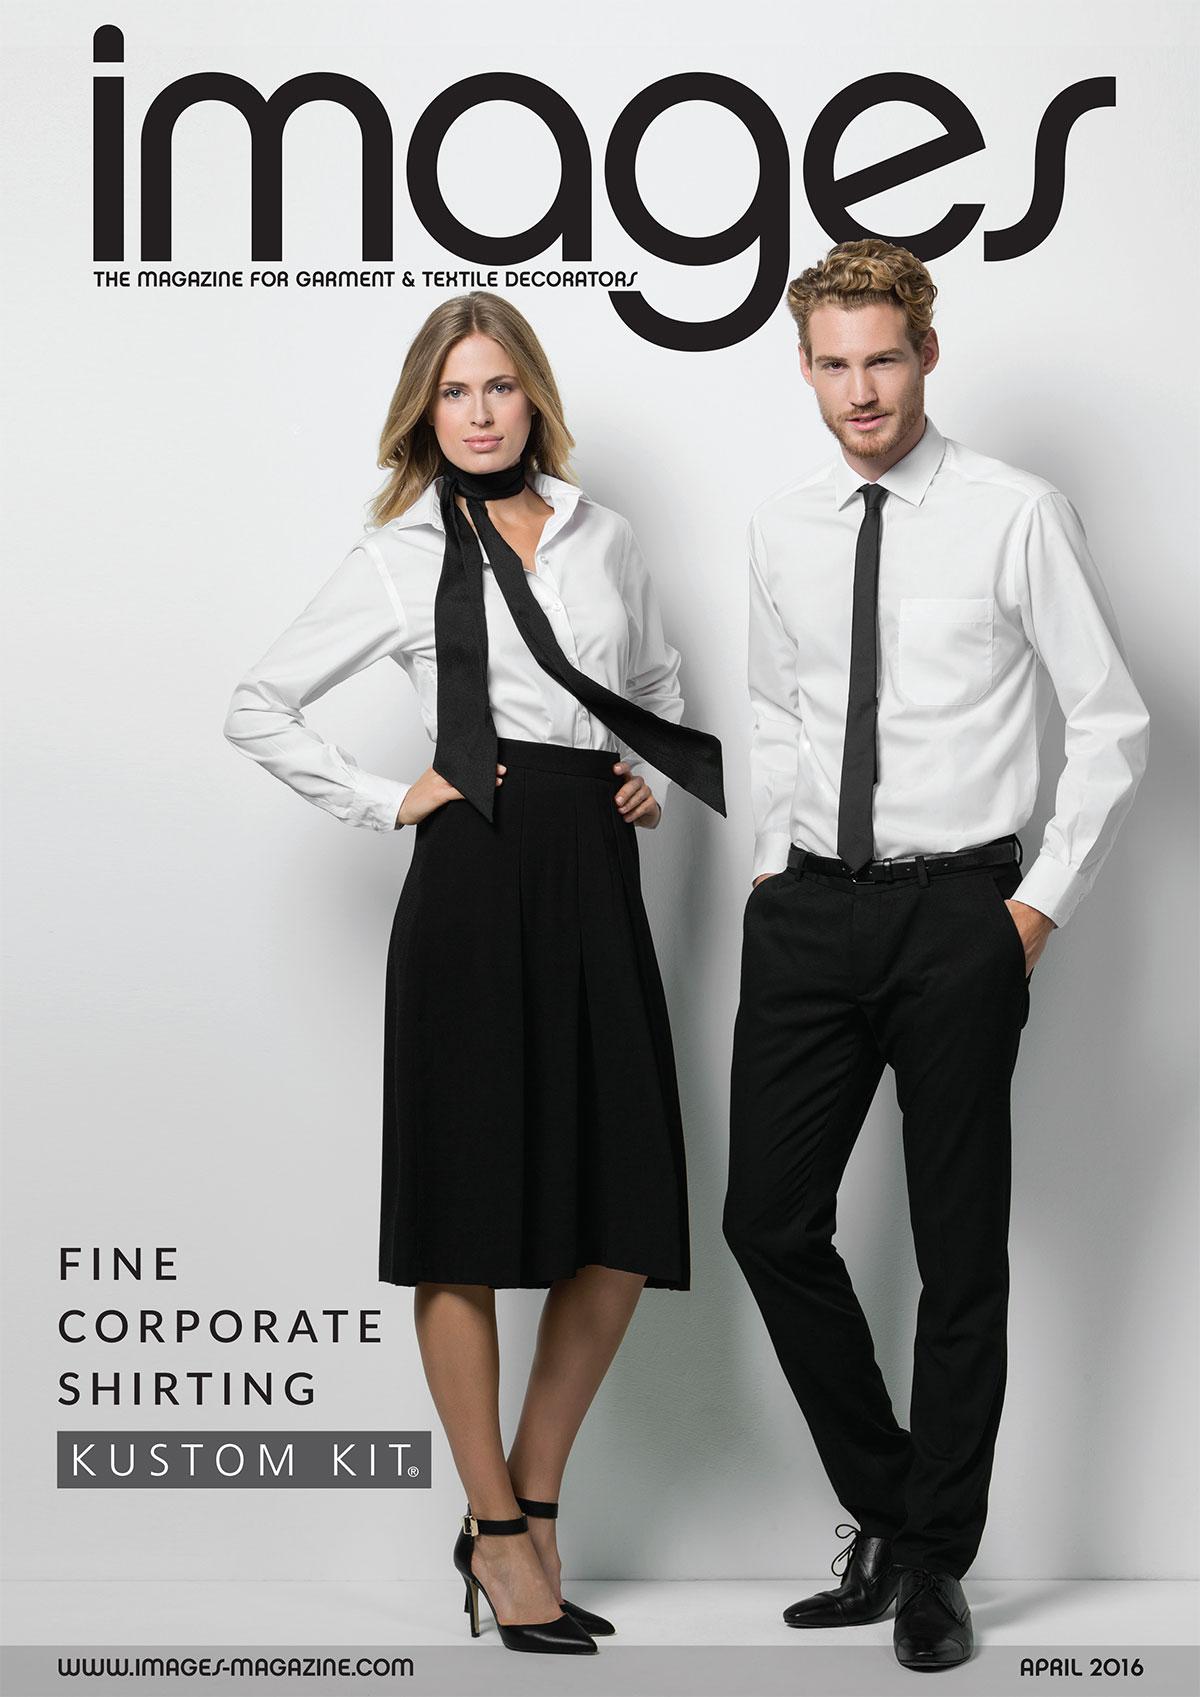 images magazine april 2016 kustom kit cover